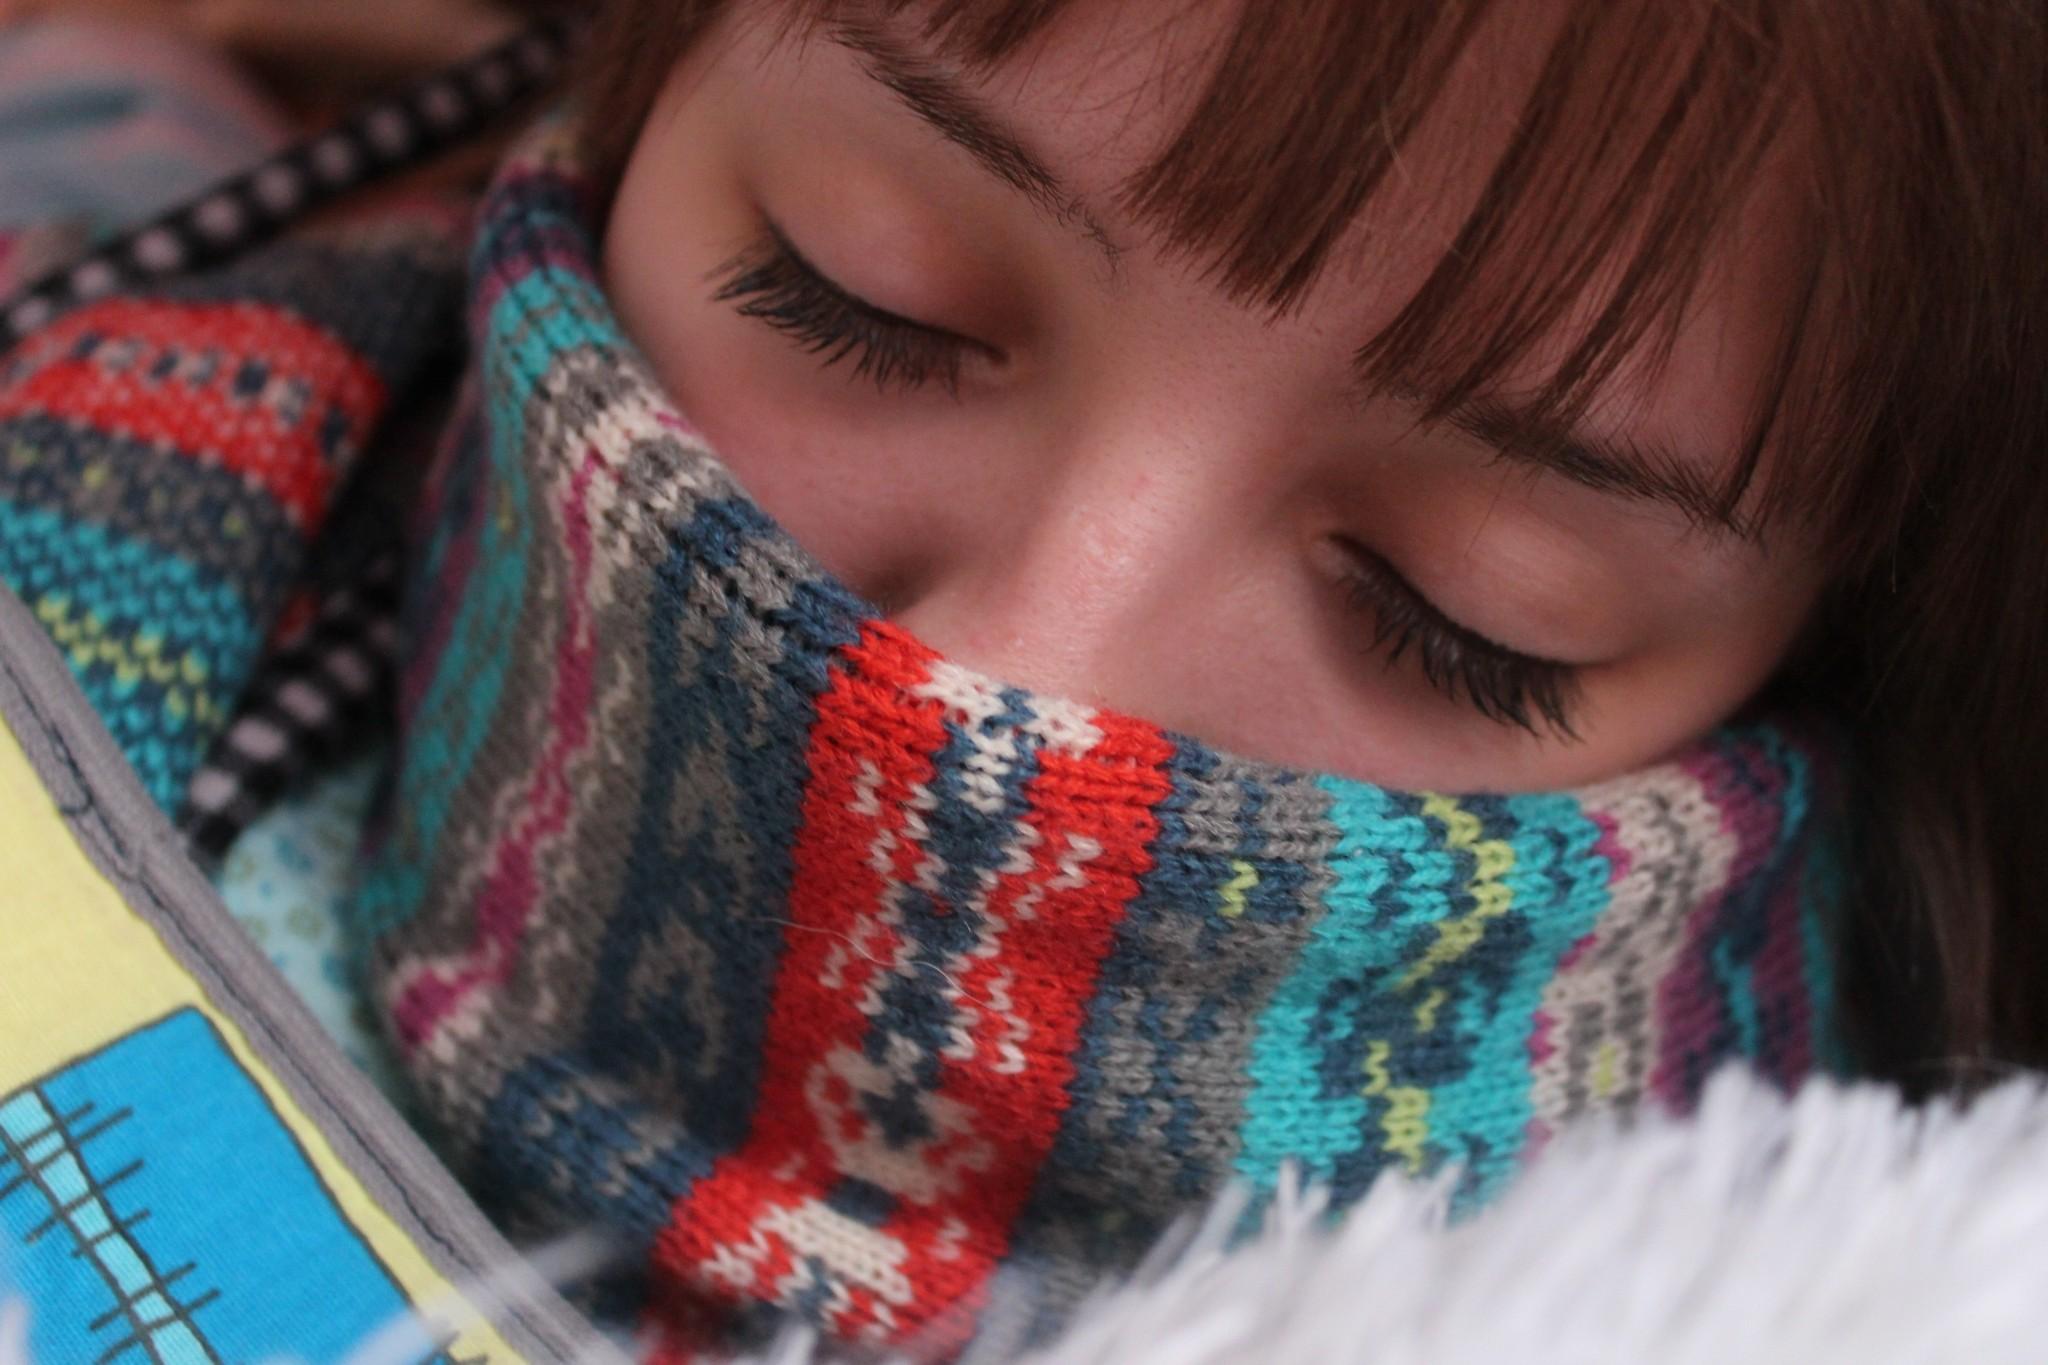 influenza cold-comfort-cover-cute-266679 (1)